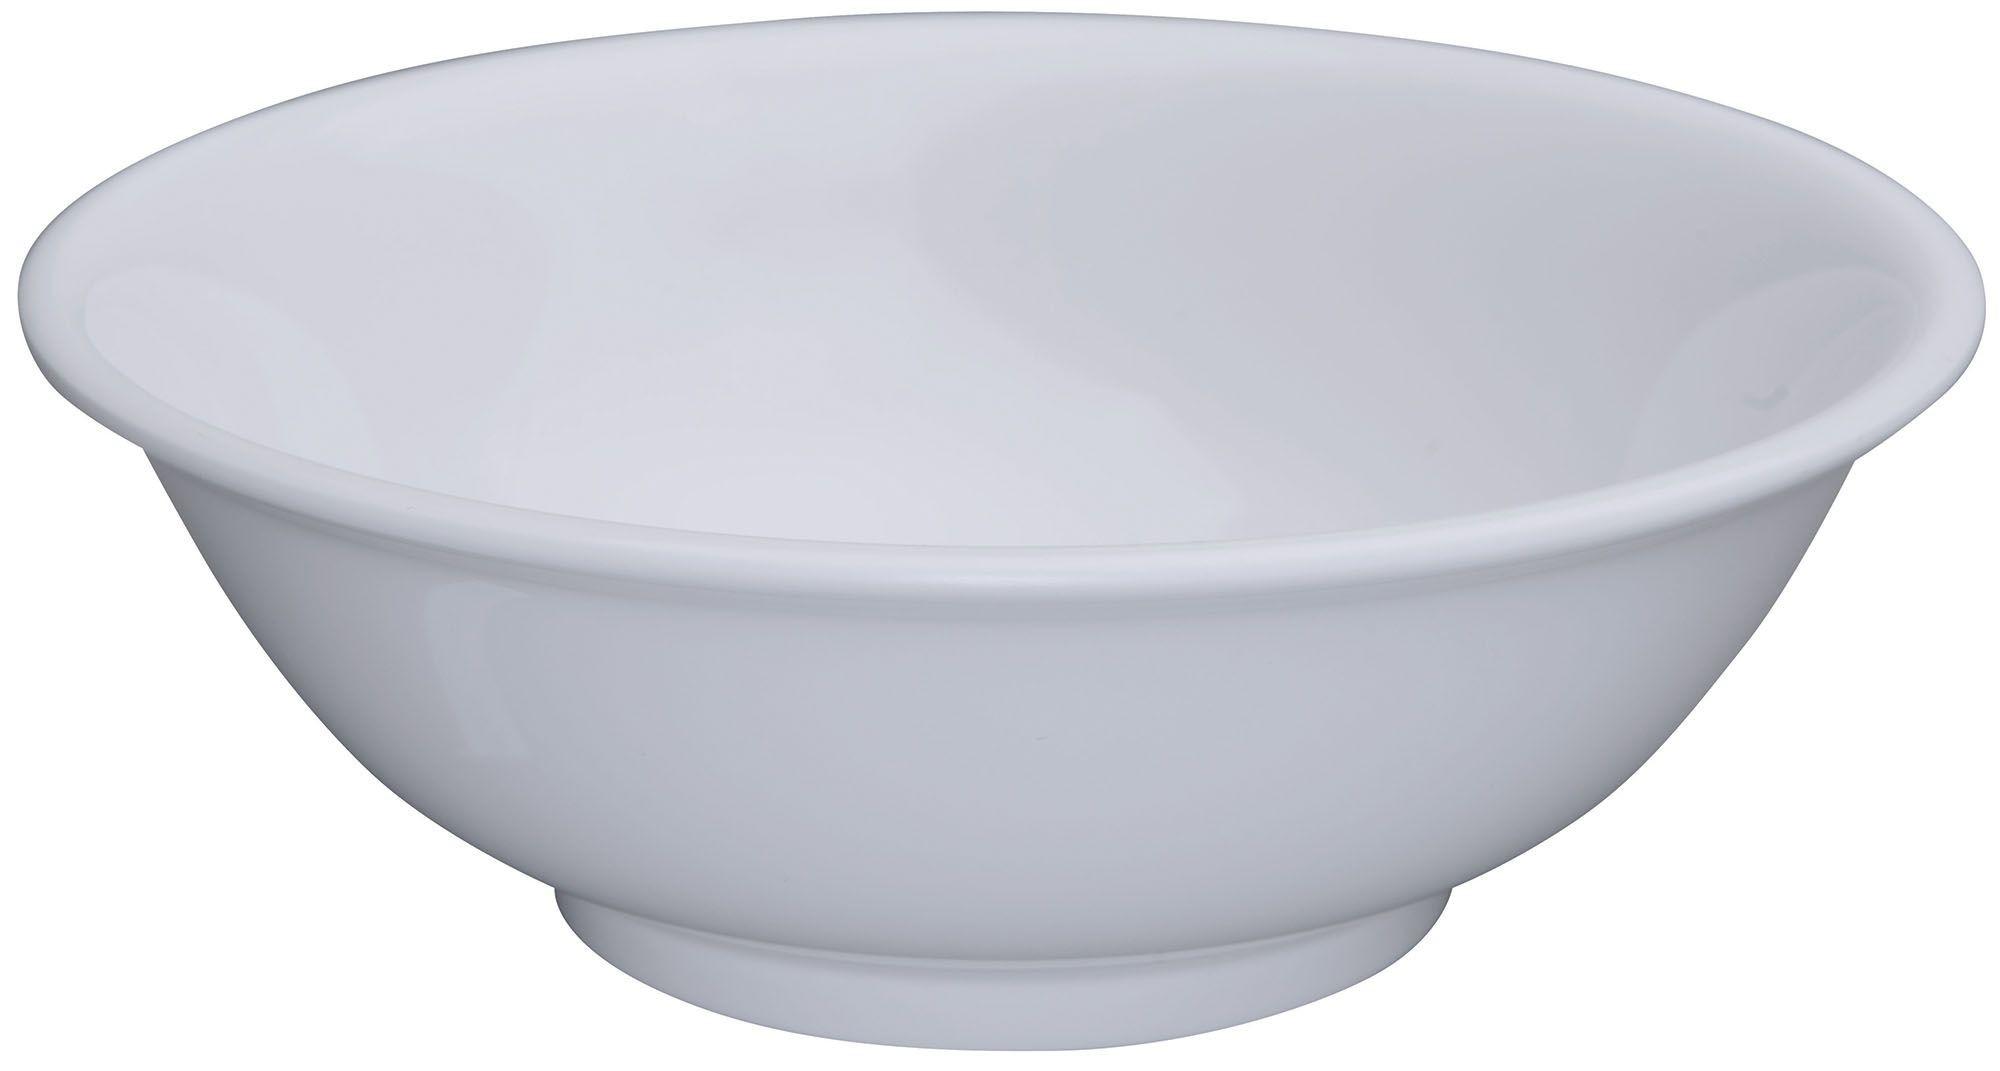 Winco MMB-96W White Melamine Rimless Bowl 96 oz.